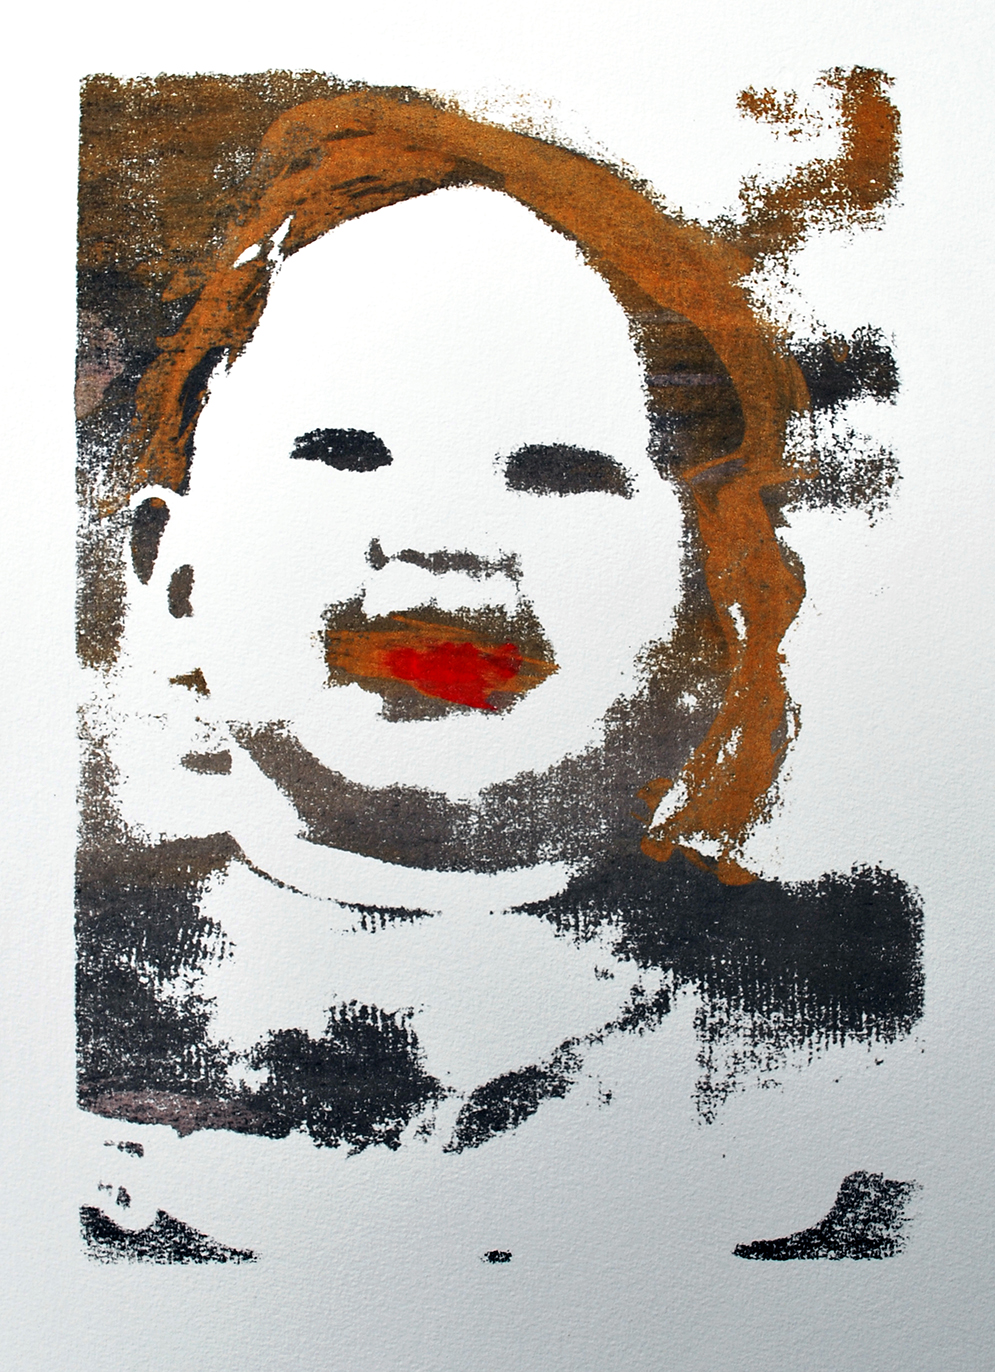 Zelfportret kind^ zeefdruk - 30x20cm